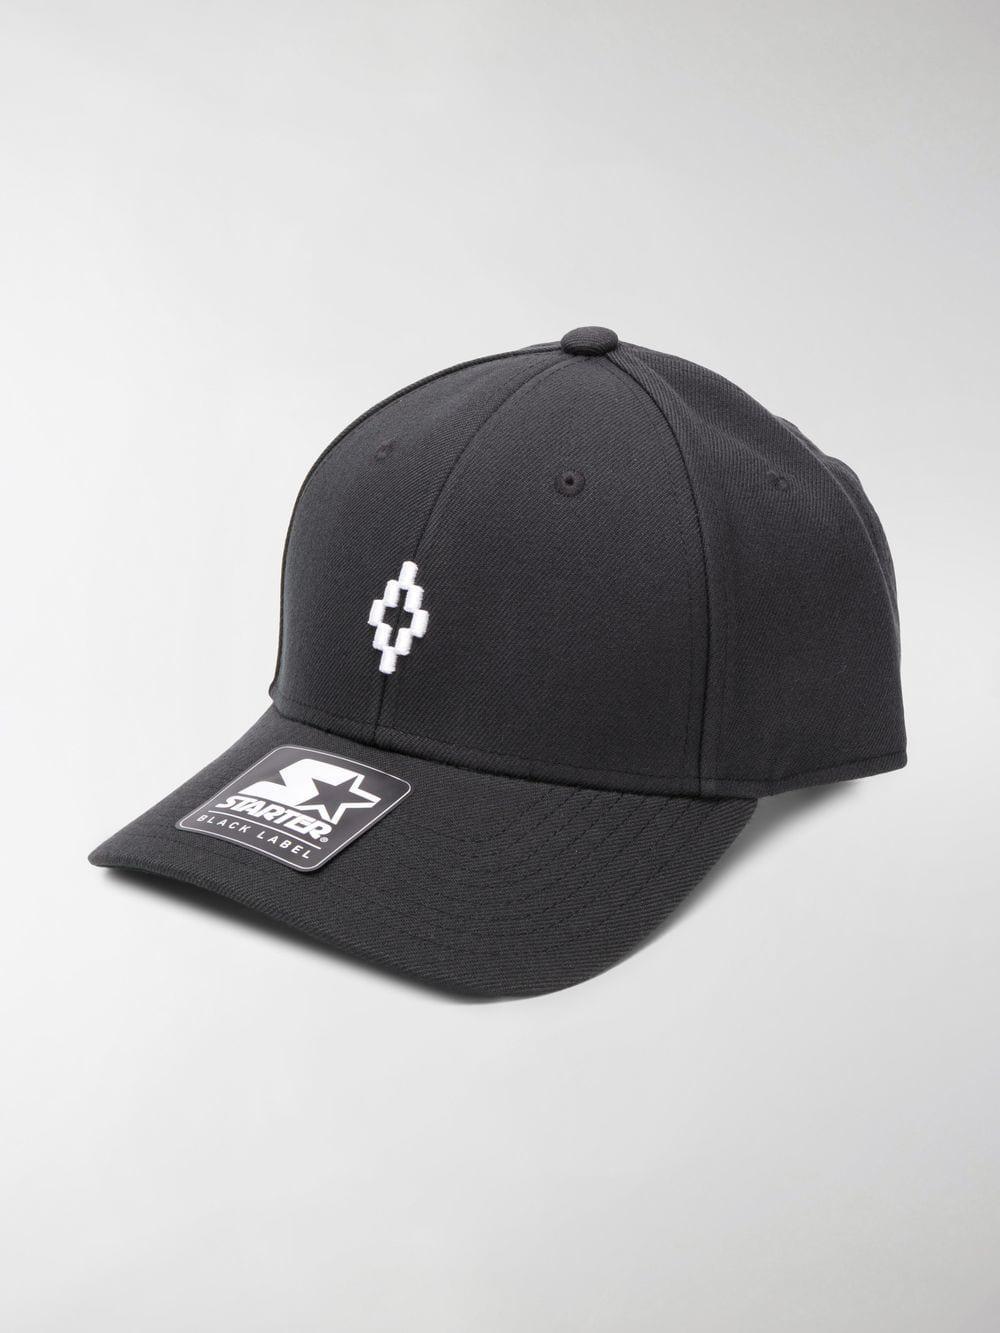 a8d3756bb6c Lyst - Marcelo Burlon Starter Cross Cap in Black for Men